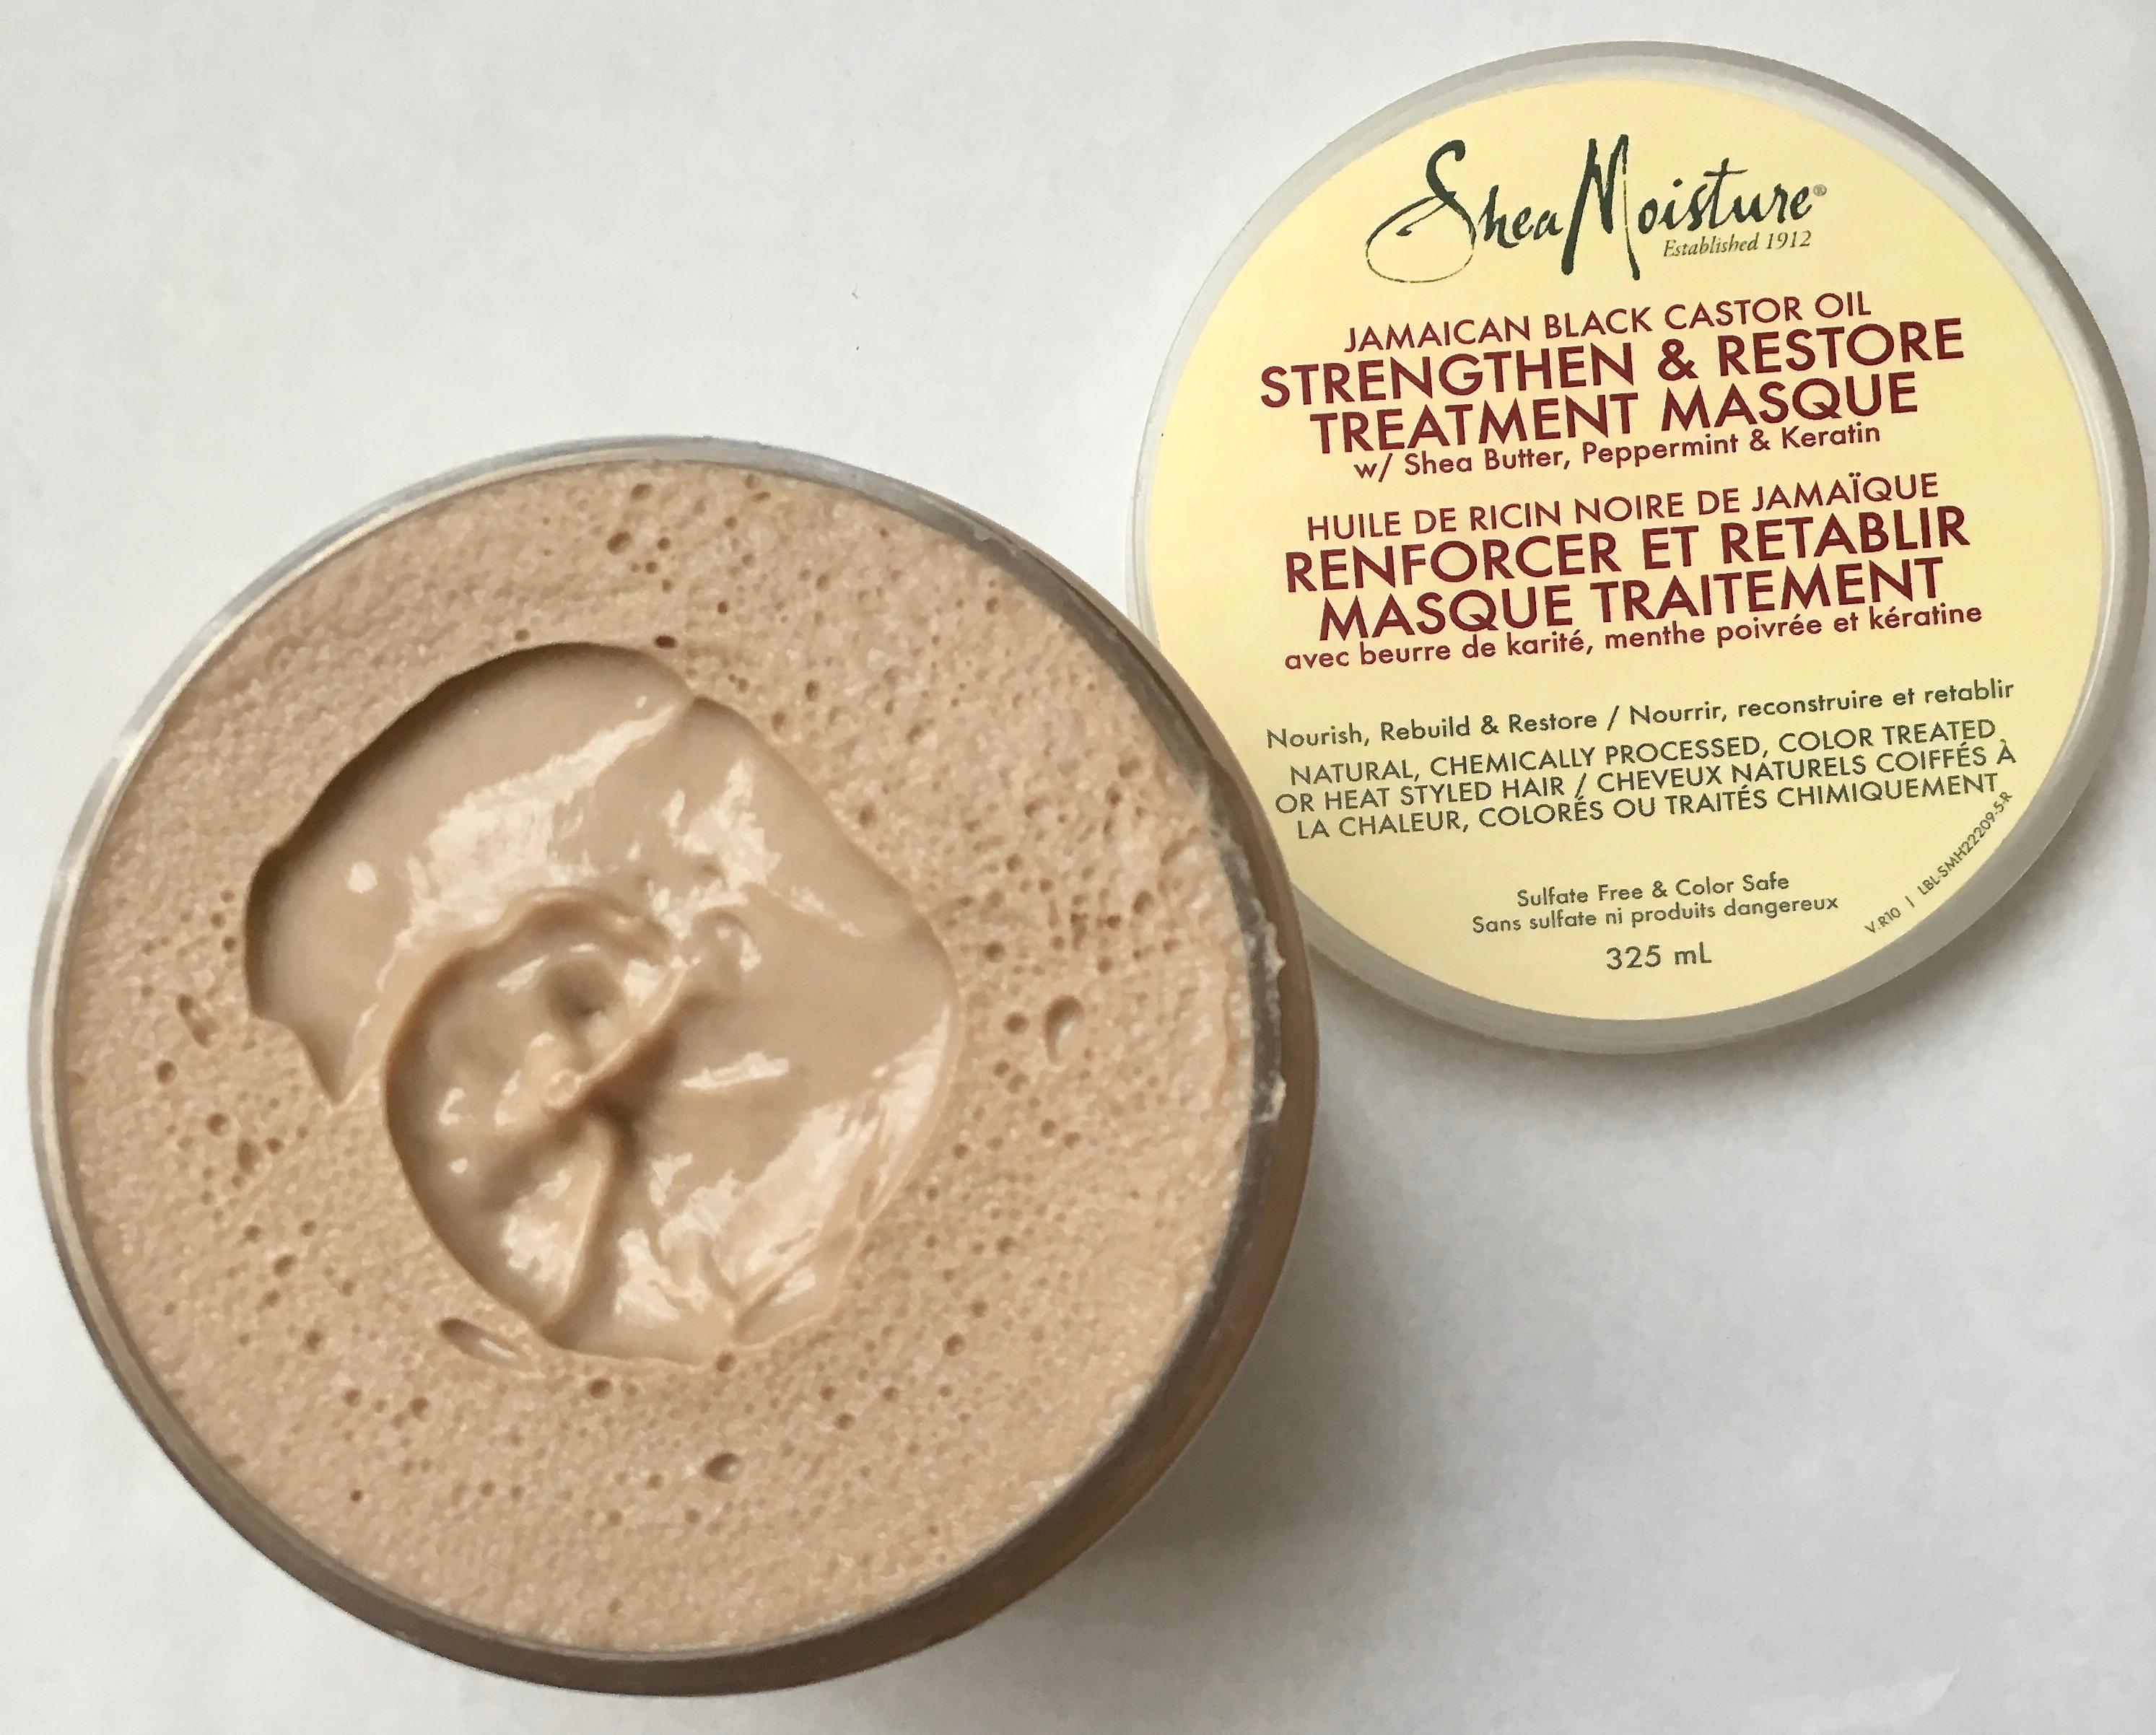 Shea Moisture Jamaican Black Castor Oil Strengthen + Restore Treatment Masque